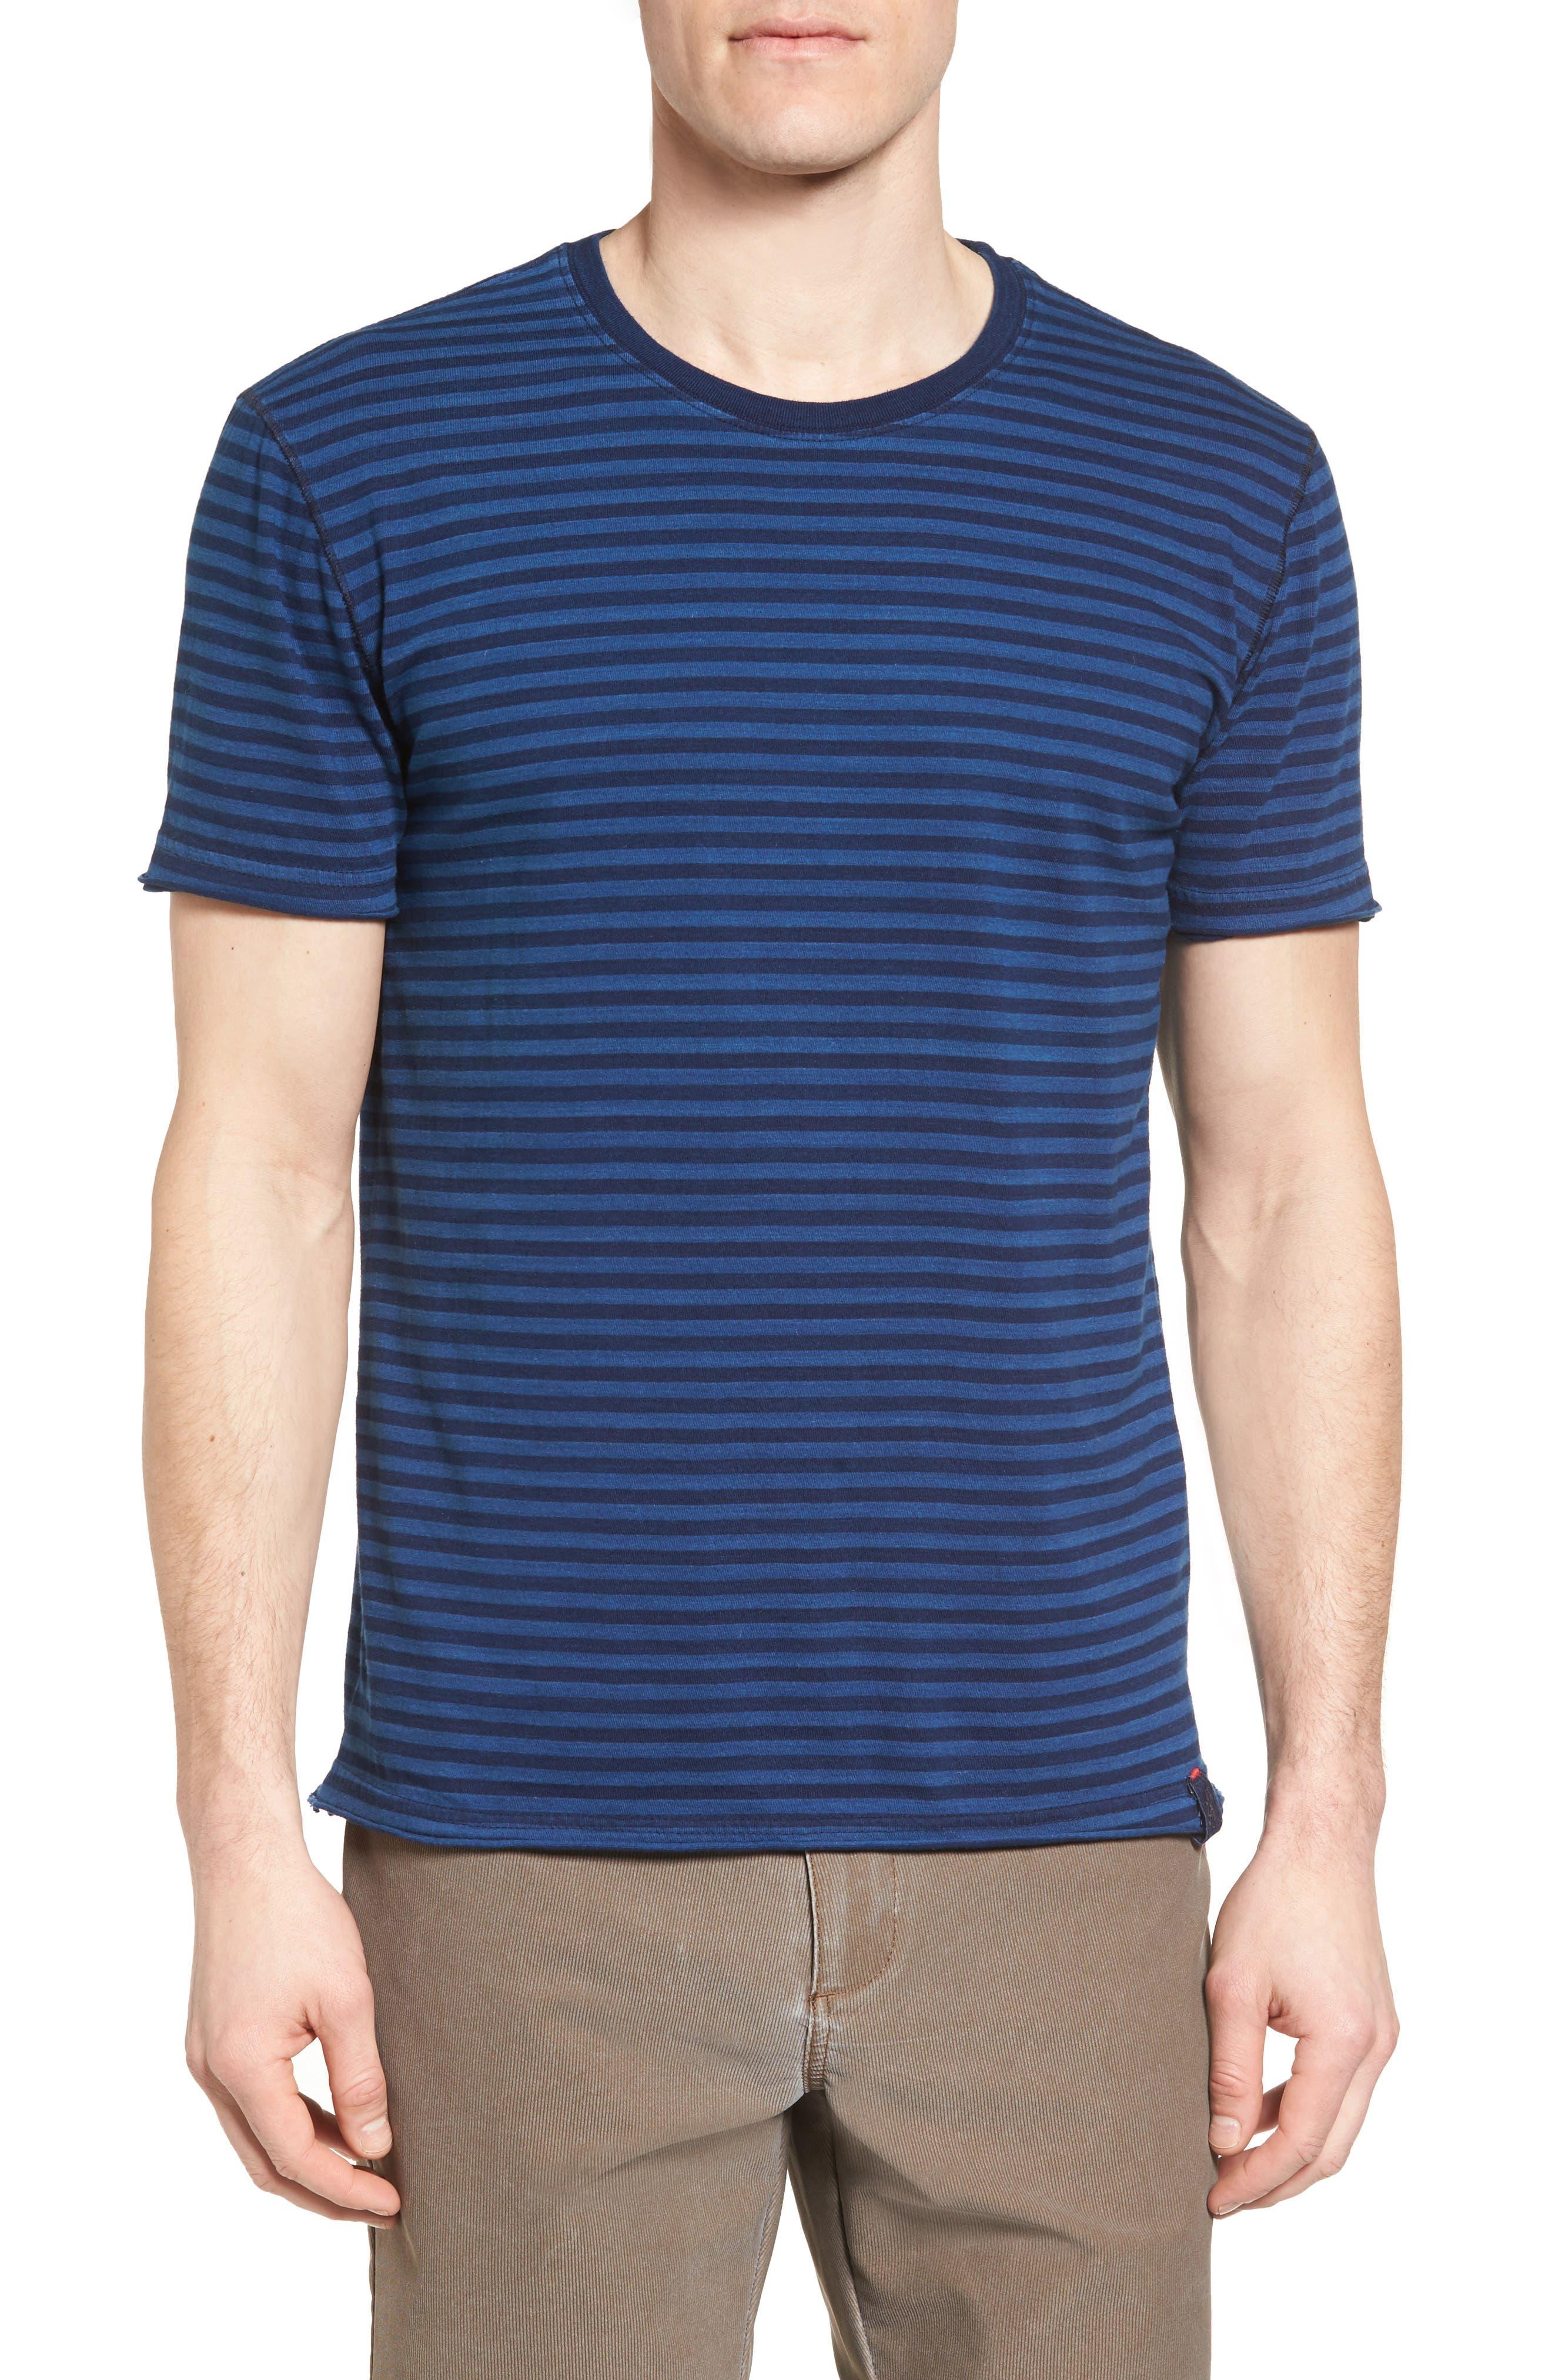 Take It Slow T-Shirt,                         Main,                         color, 441